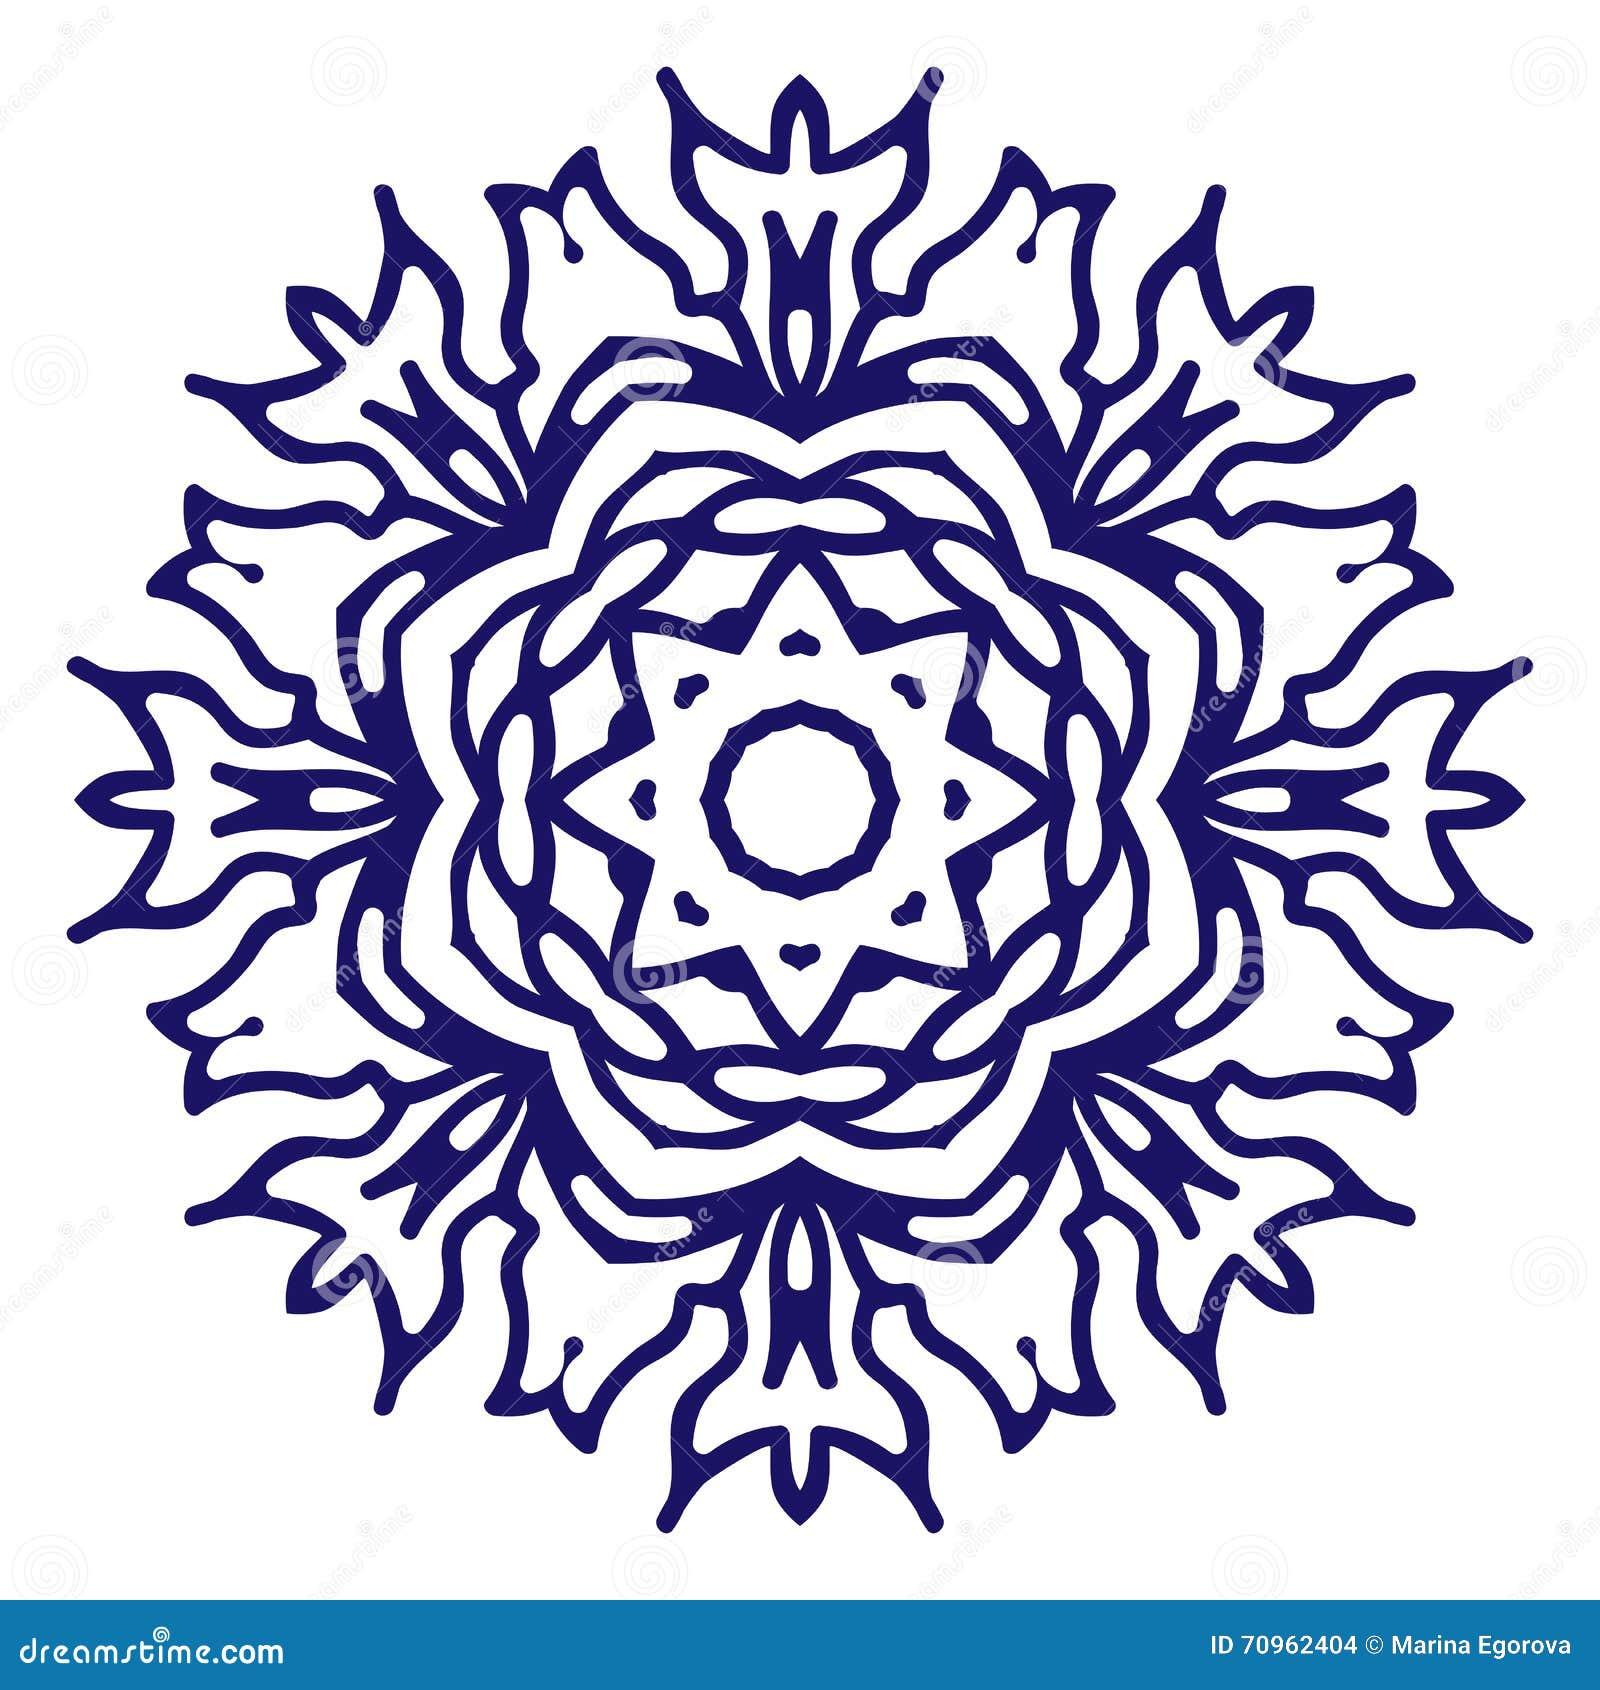 Islam buddism christianity